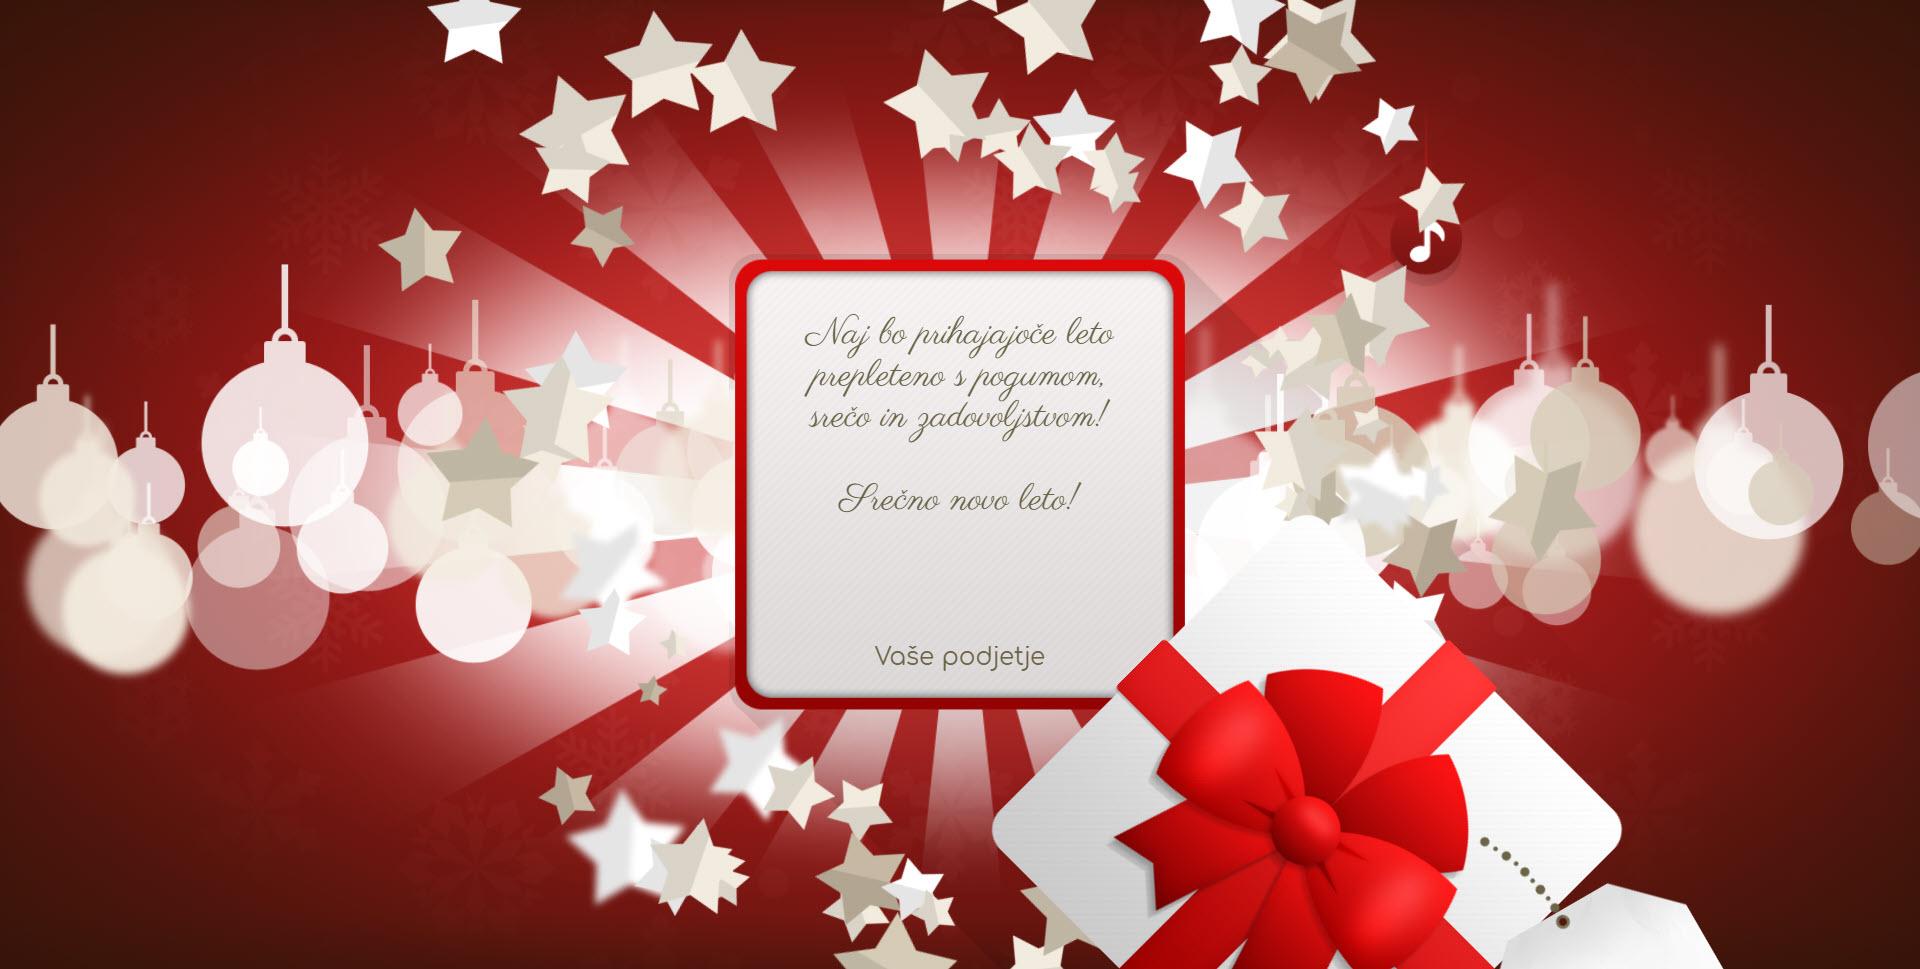 christmas card gift for you version red - Naročilo voščilnice